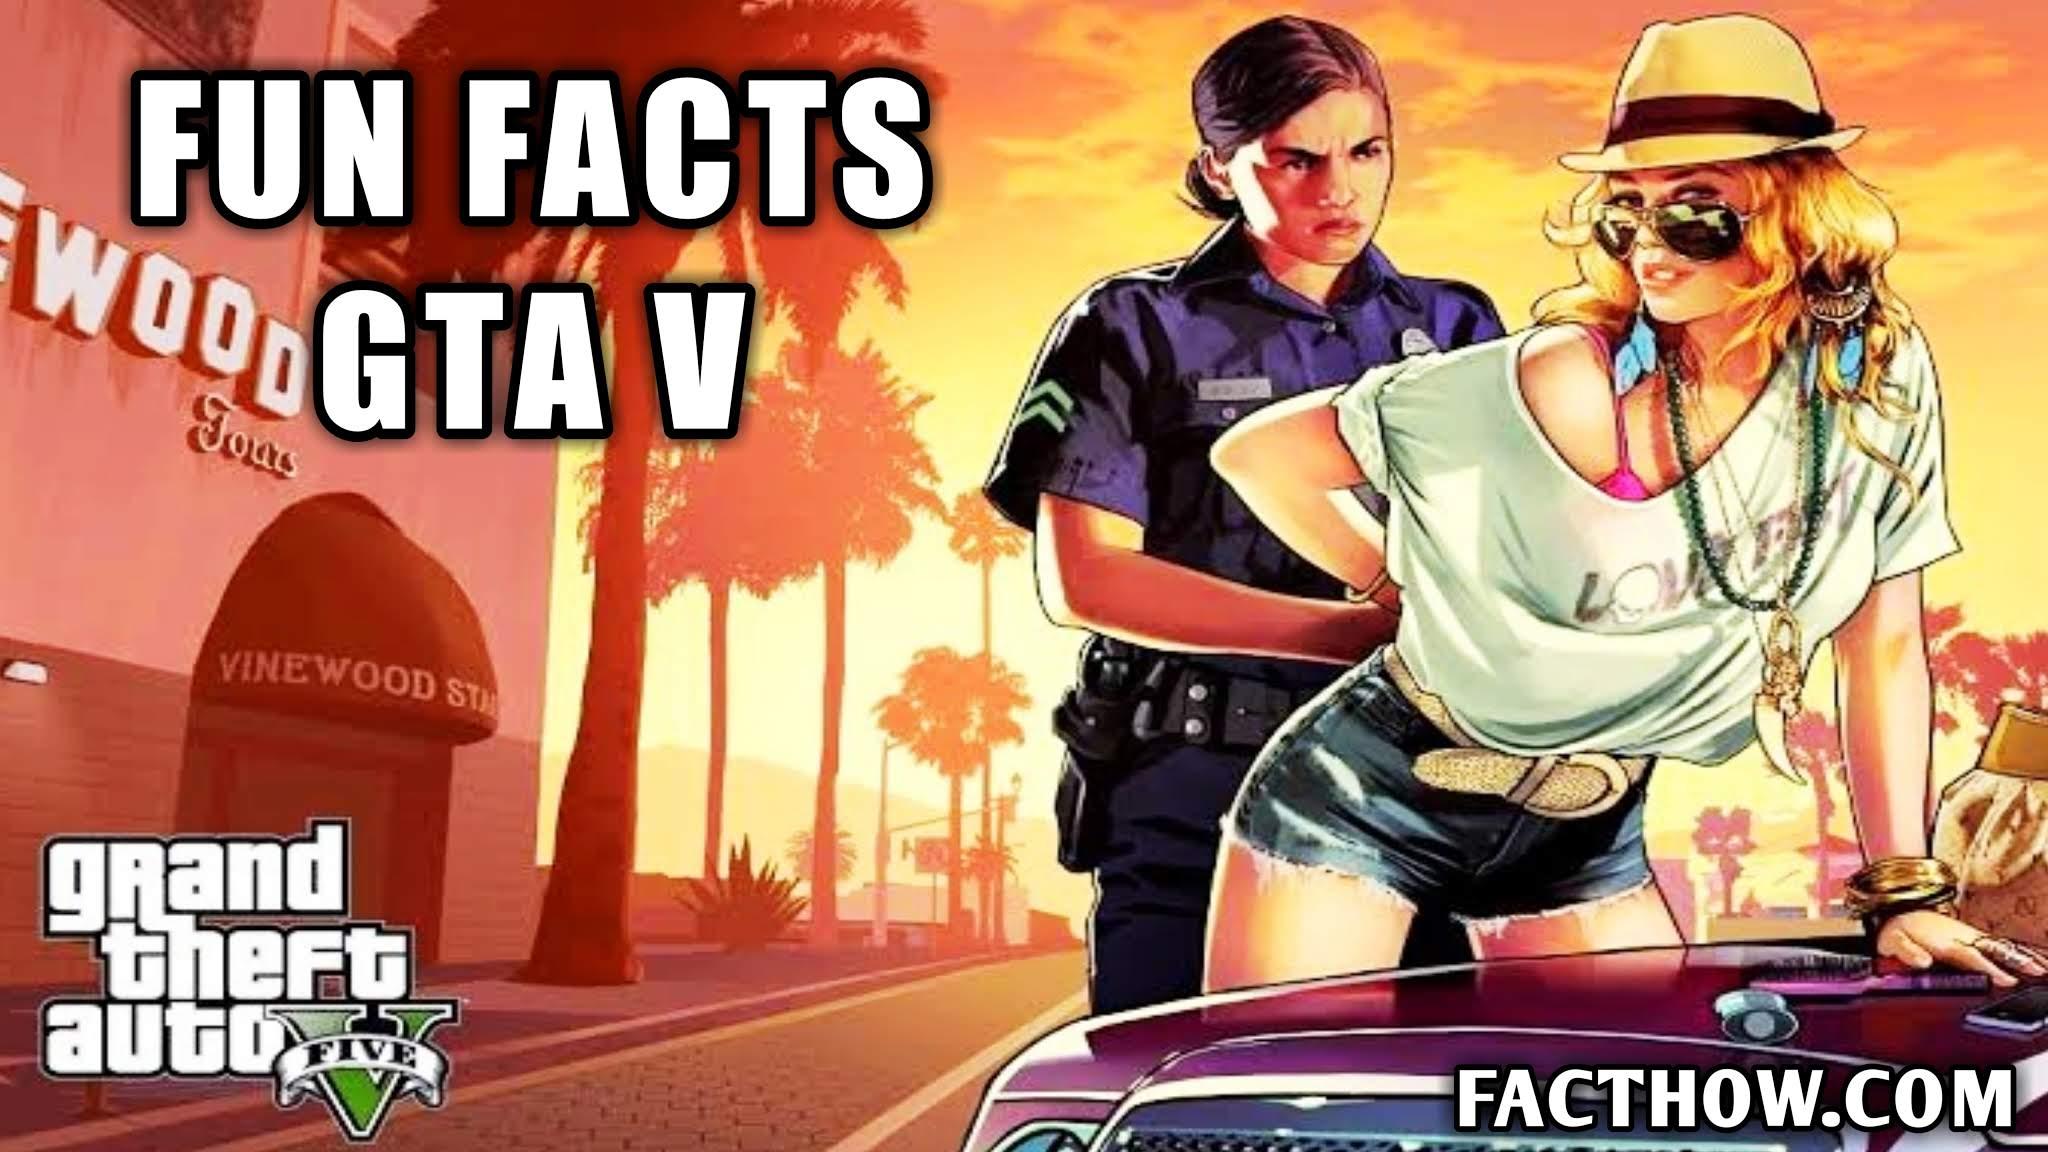 gta-v-facts-hindi-gaming-facts-xbox-360-gta-game-grand-theft-auto-gta-game-free-download-gta-mod-graphics-free-download-fact-hindi-fact-how-facthow-gta-5-facts-interesting-fun-amazing-facts